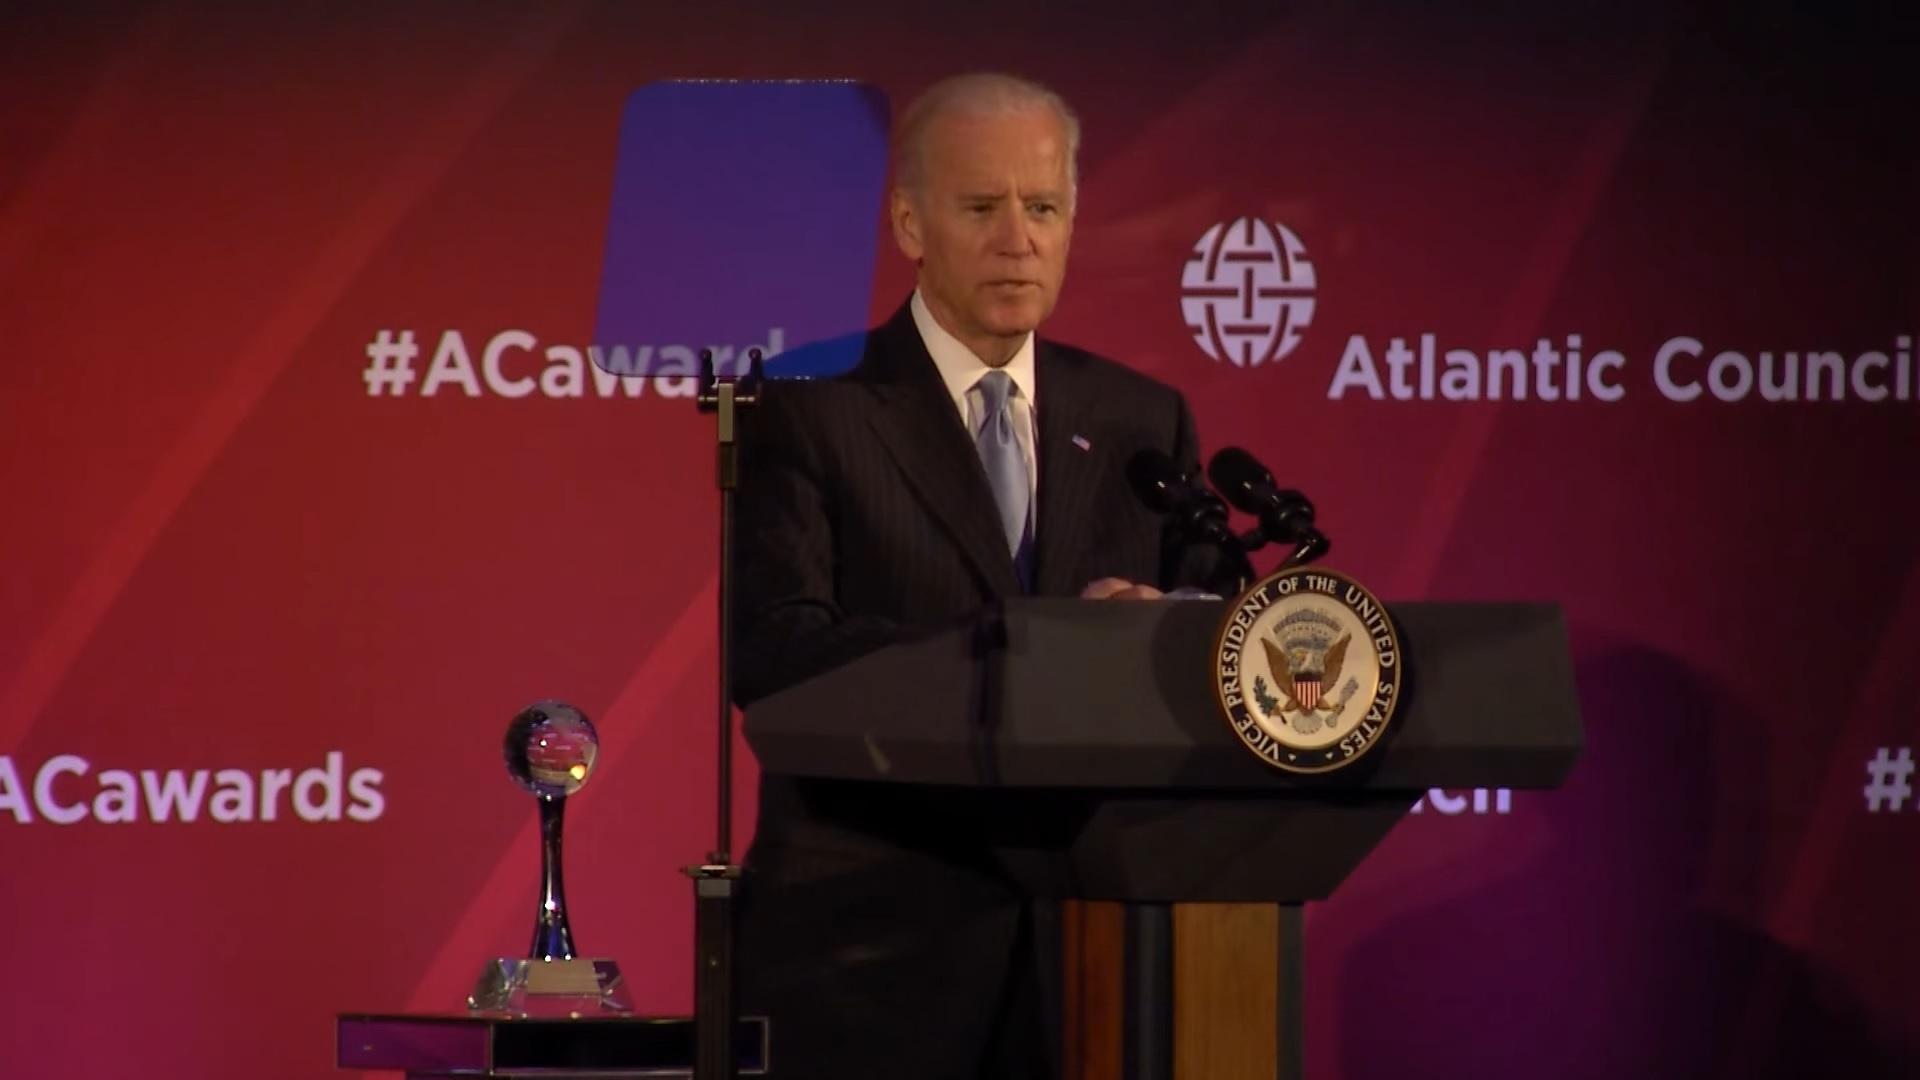 Atlantic Council Joe Biden Ukraine Burisma